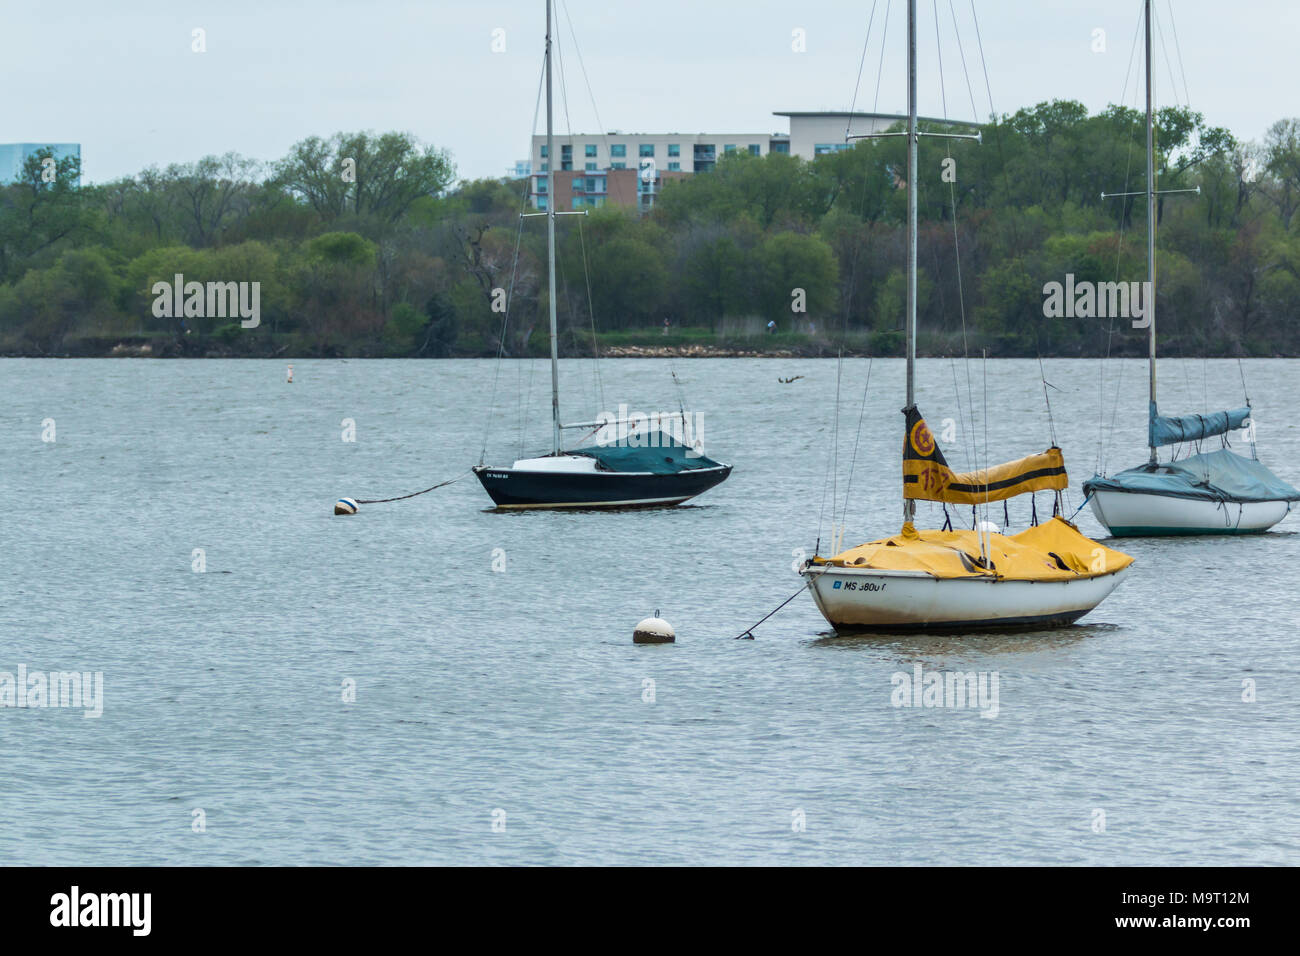 Yellow sailboat on White Rock Lake at Dallas Texas - Stock Image